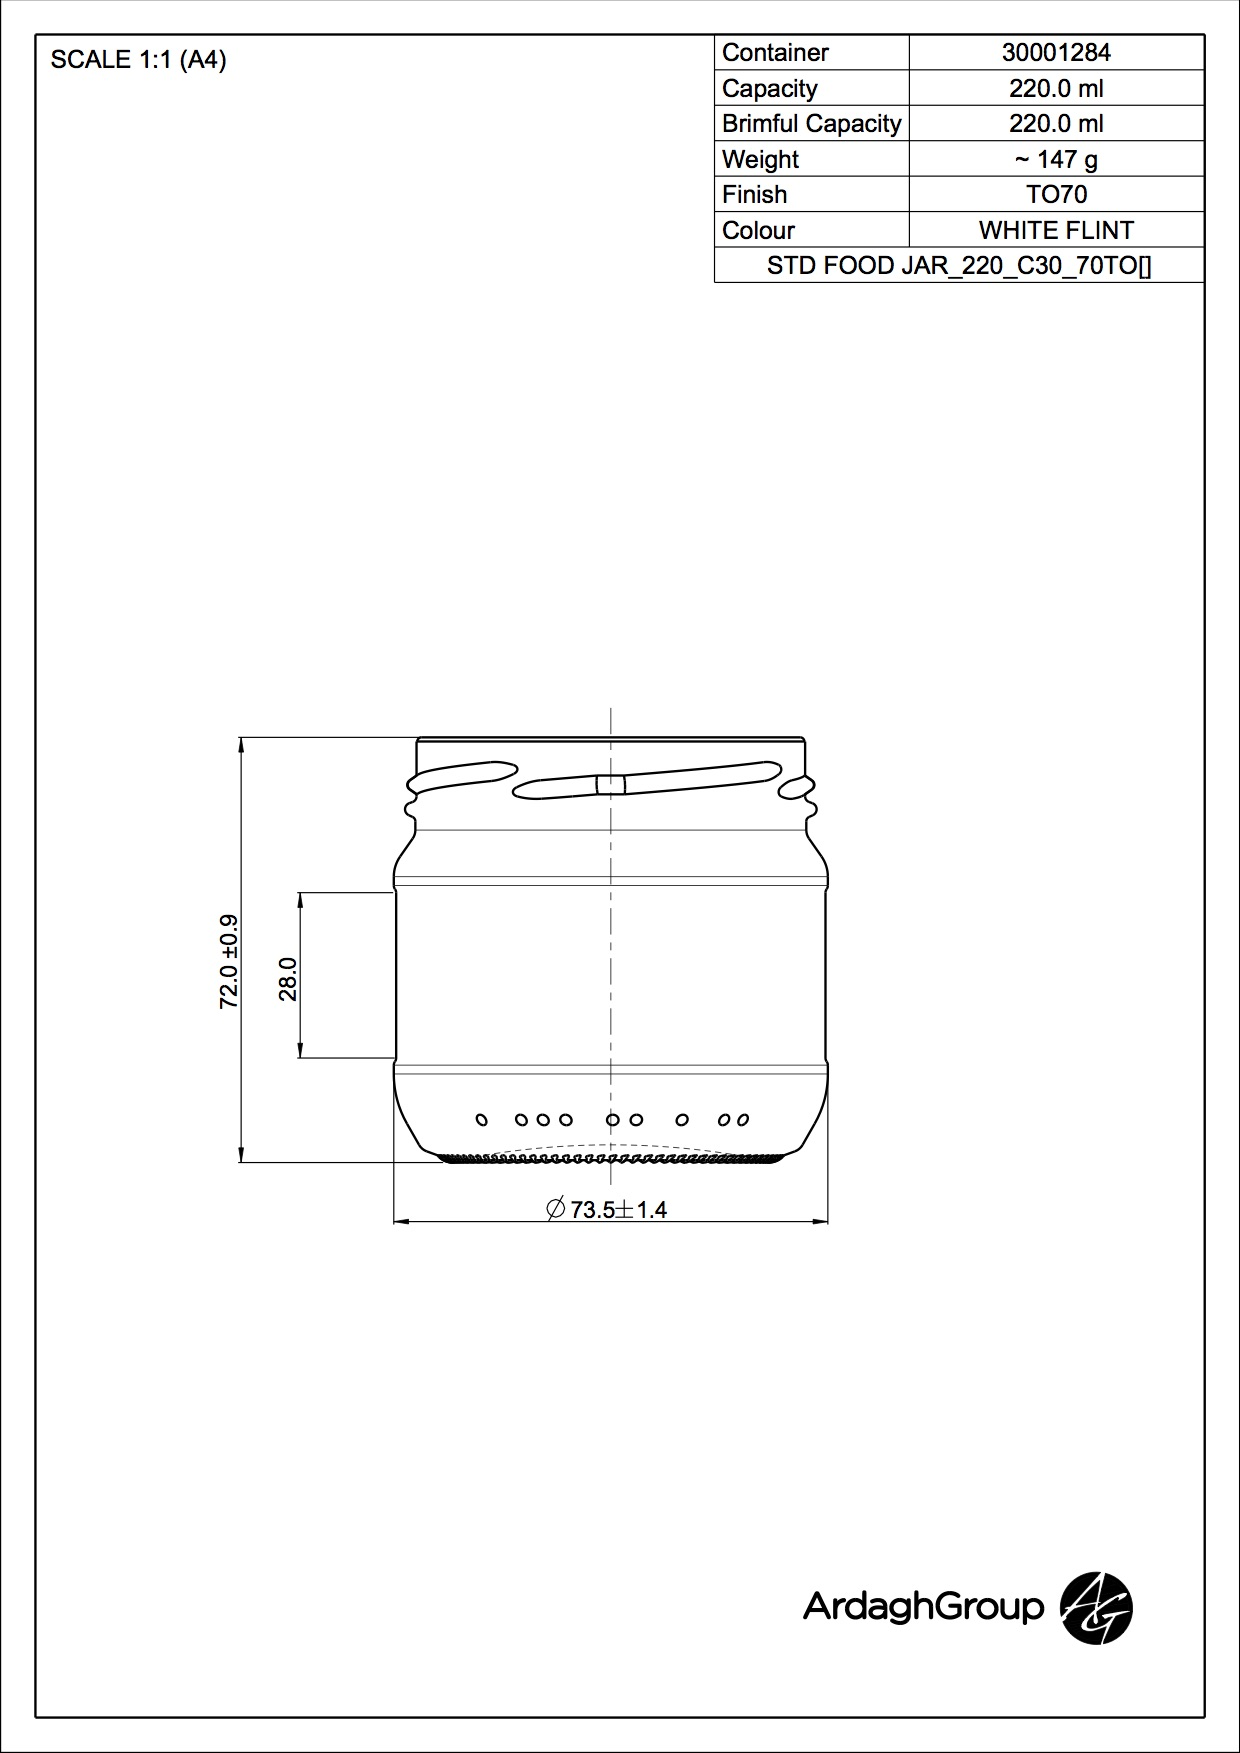 STD FOOD JAR 220 C30 70TO